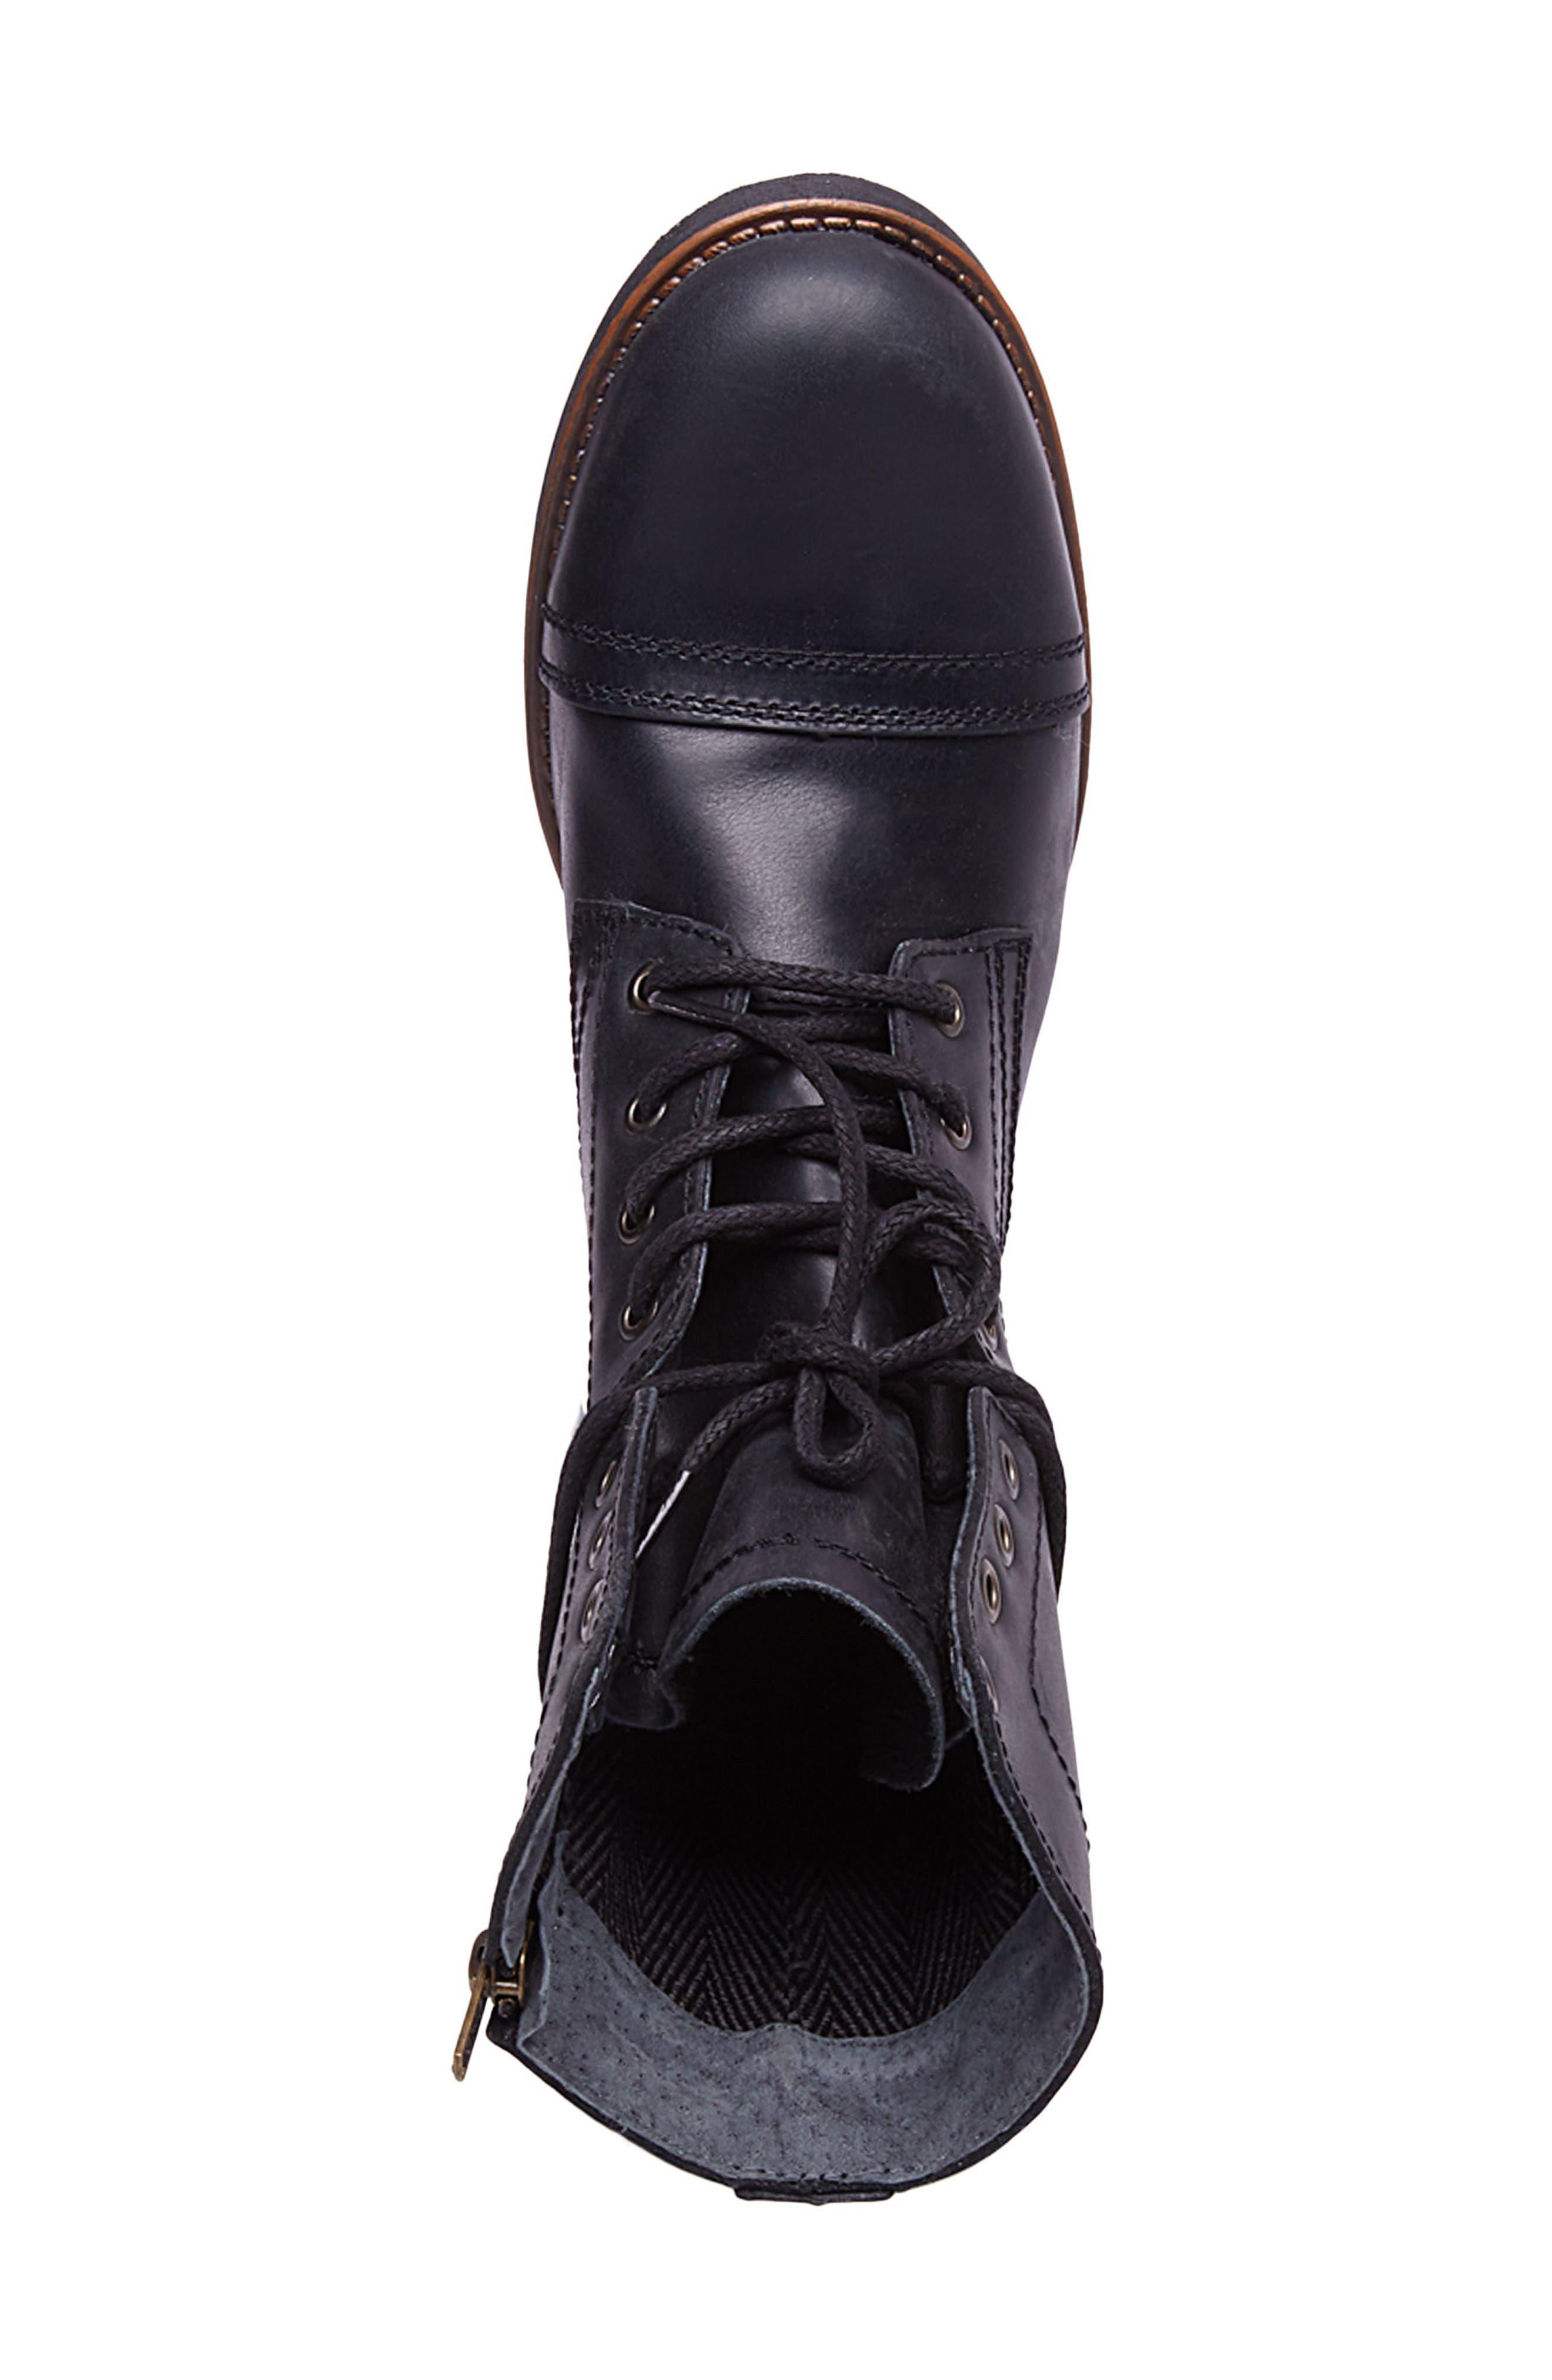 Troopah-C Cap Toe Boot,                             Alternate thumbnail 5, color,                             Black Leather